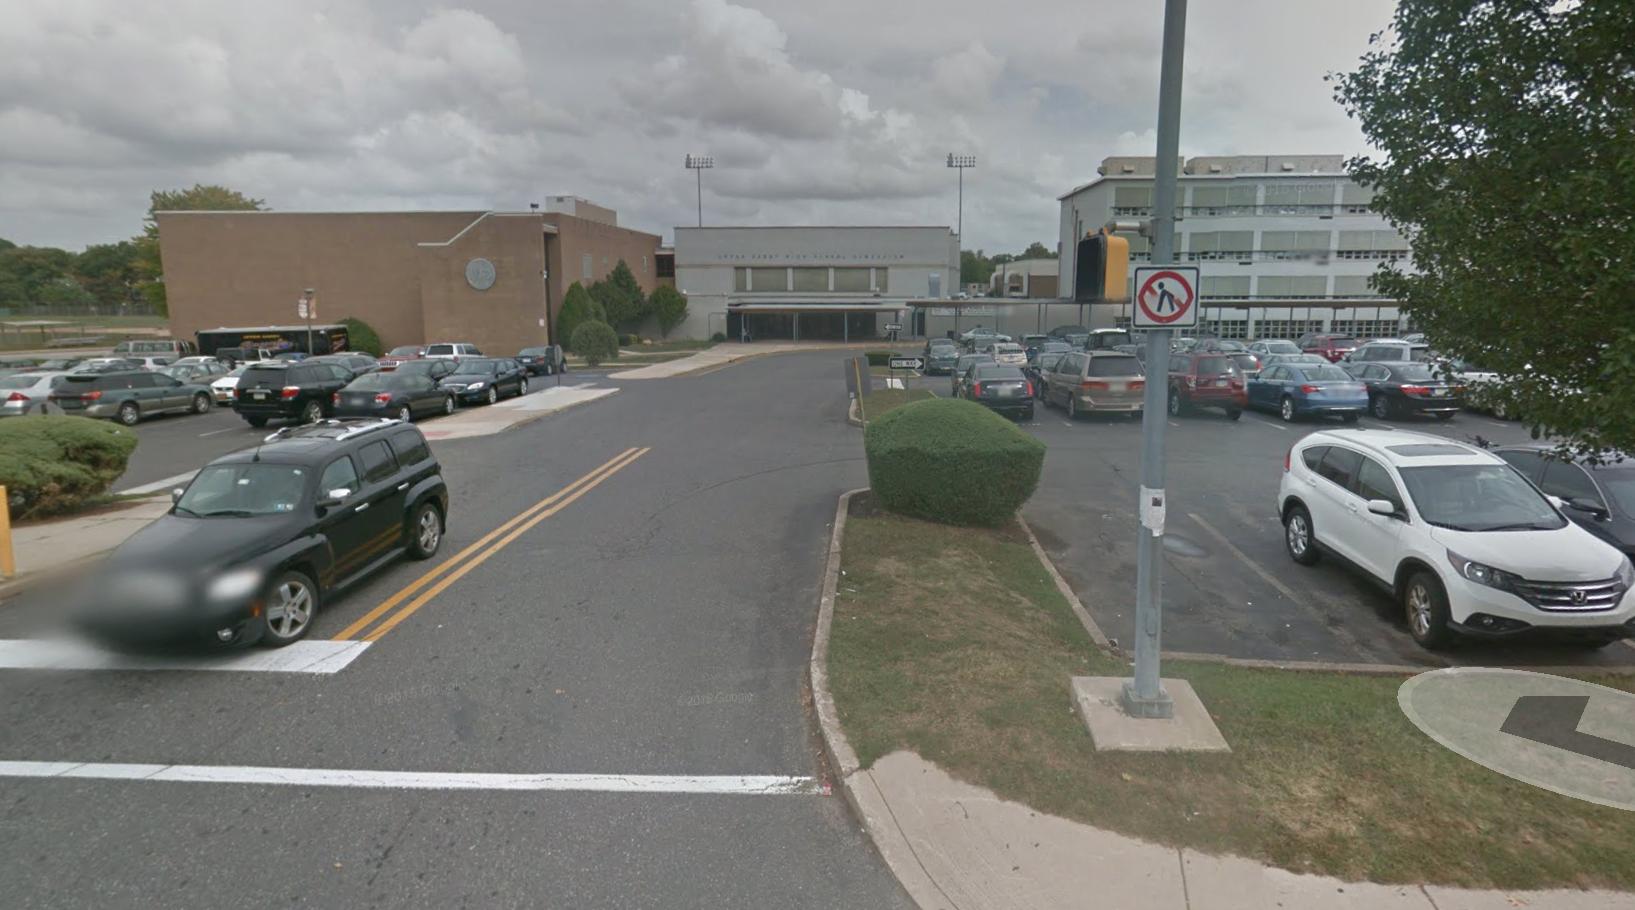 Upper Darby School District / Homepage